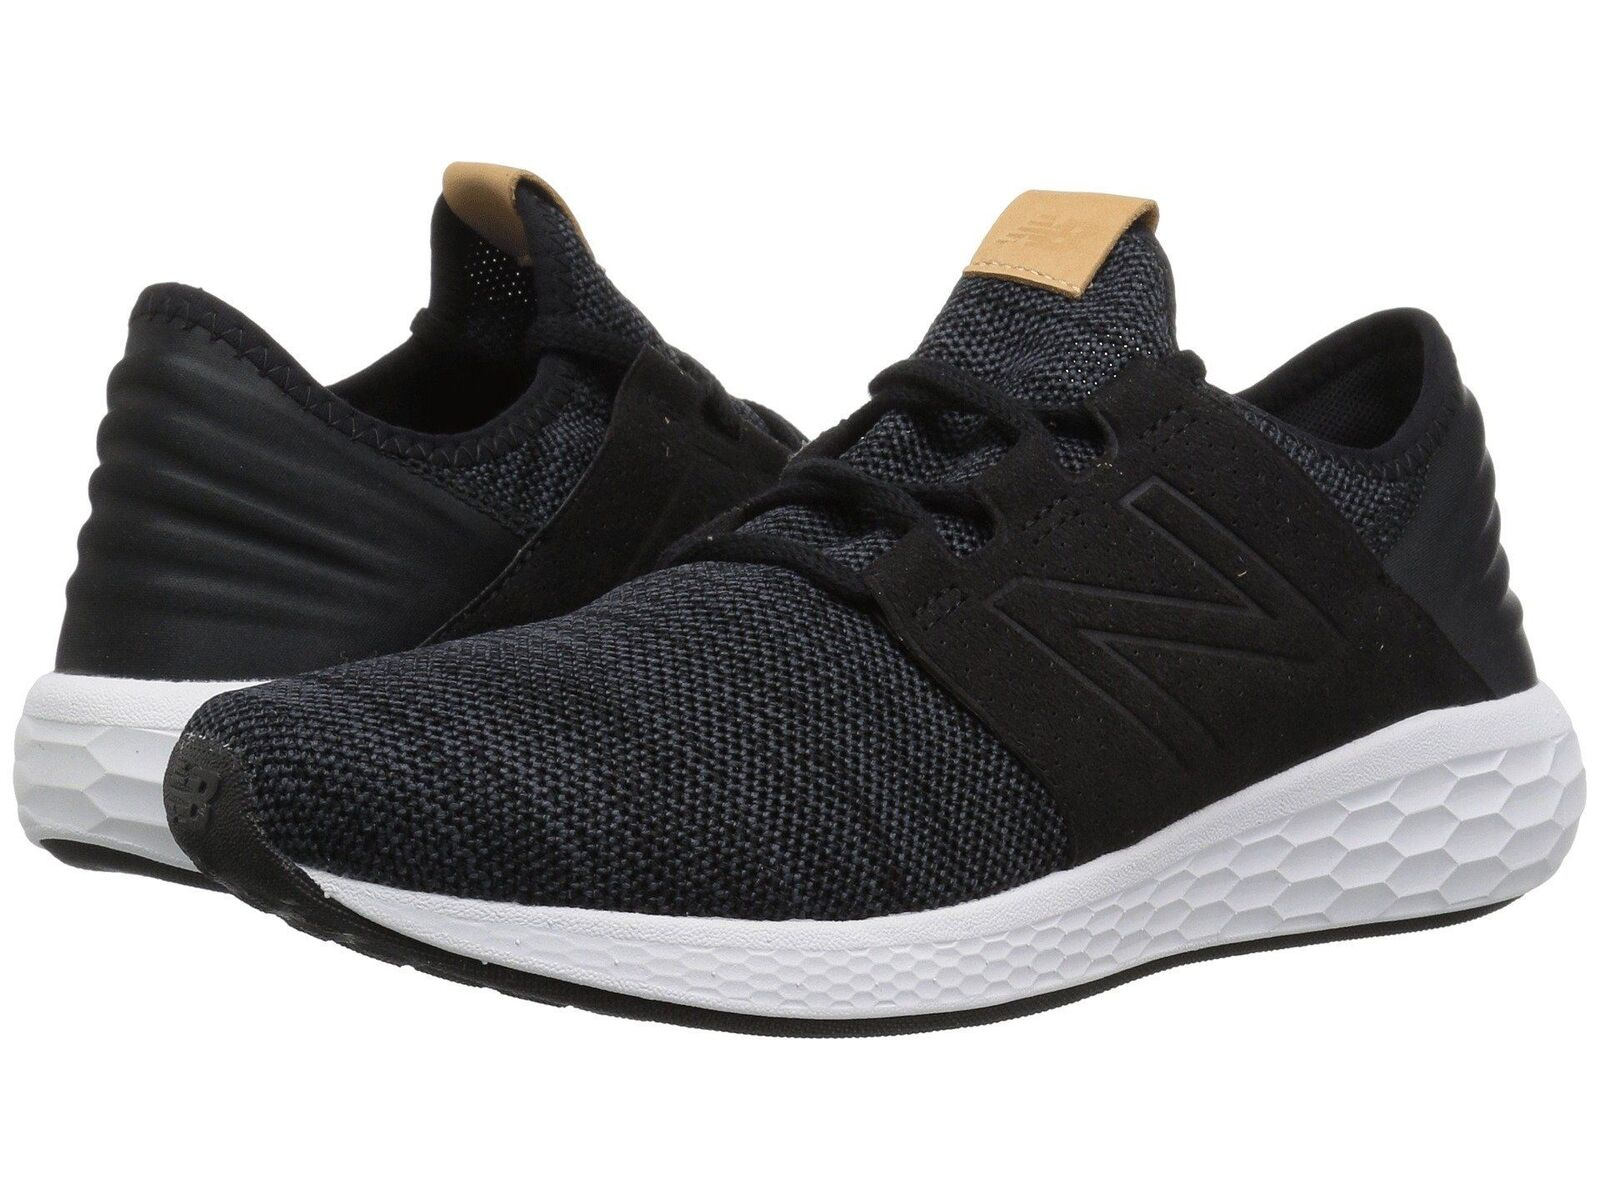 New New New Balance Fresh Foam Cruz v2 Knit MCRUZKB2 Black Men's Running shoes 95fea9